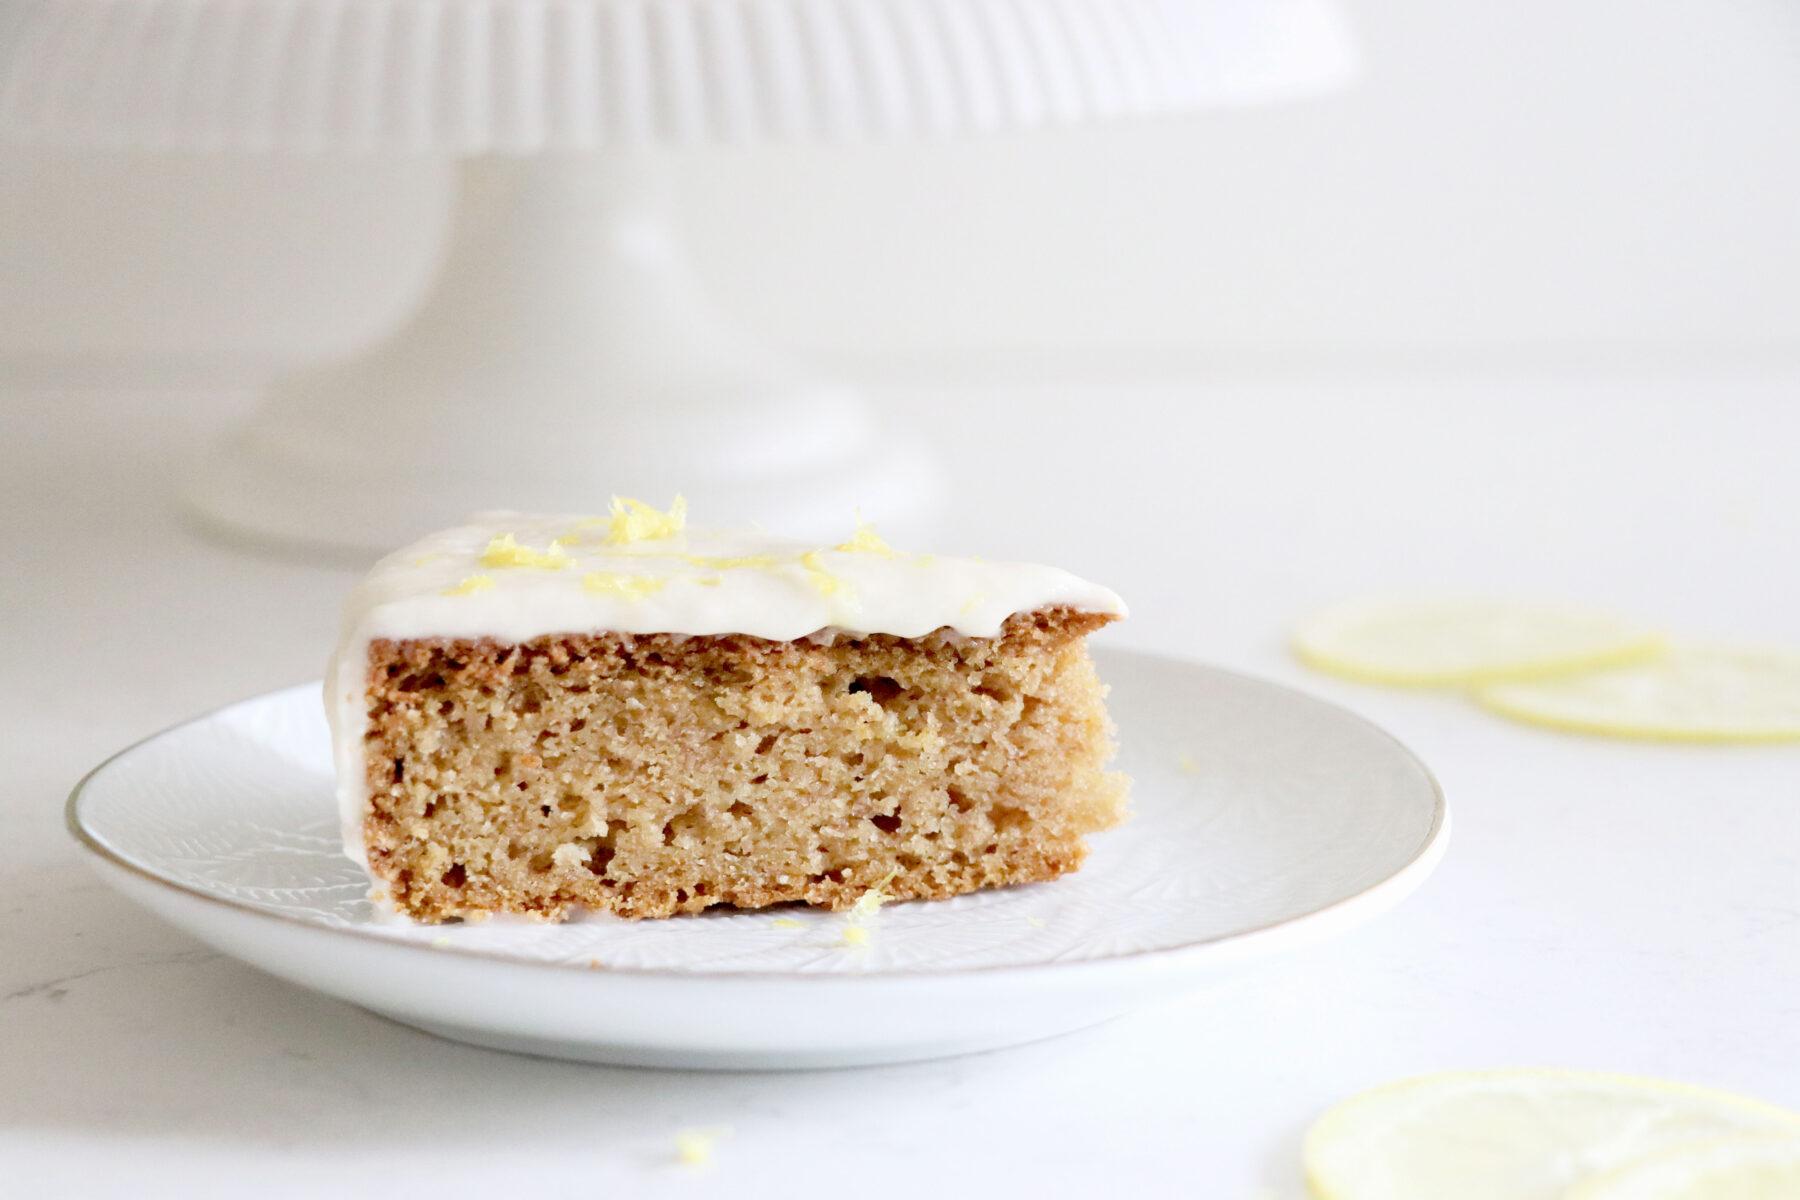 Slice of lemon cake on white plate with white cake platter in the background.